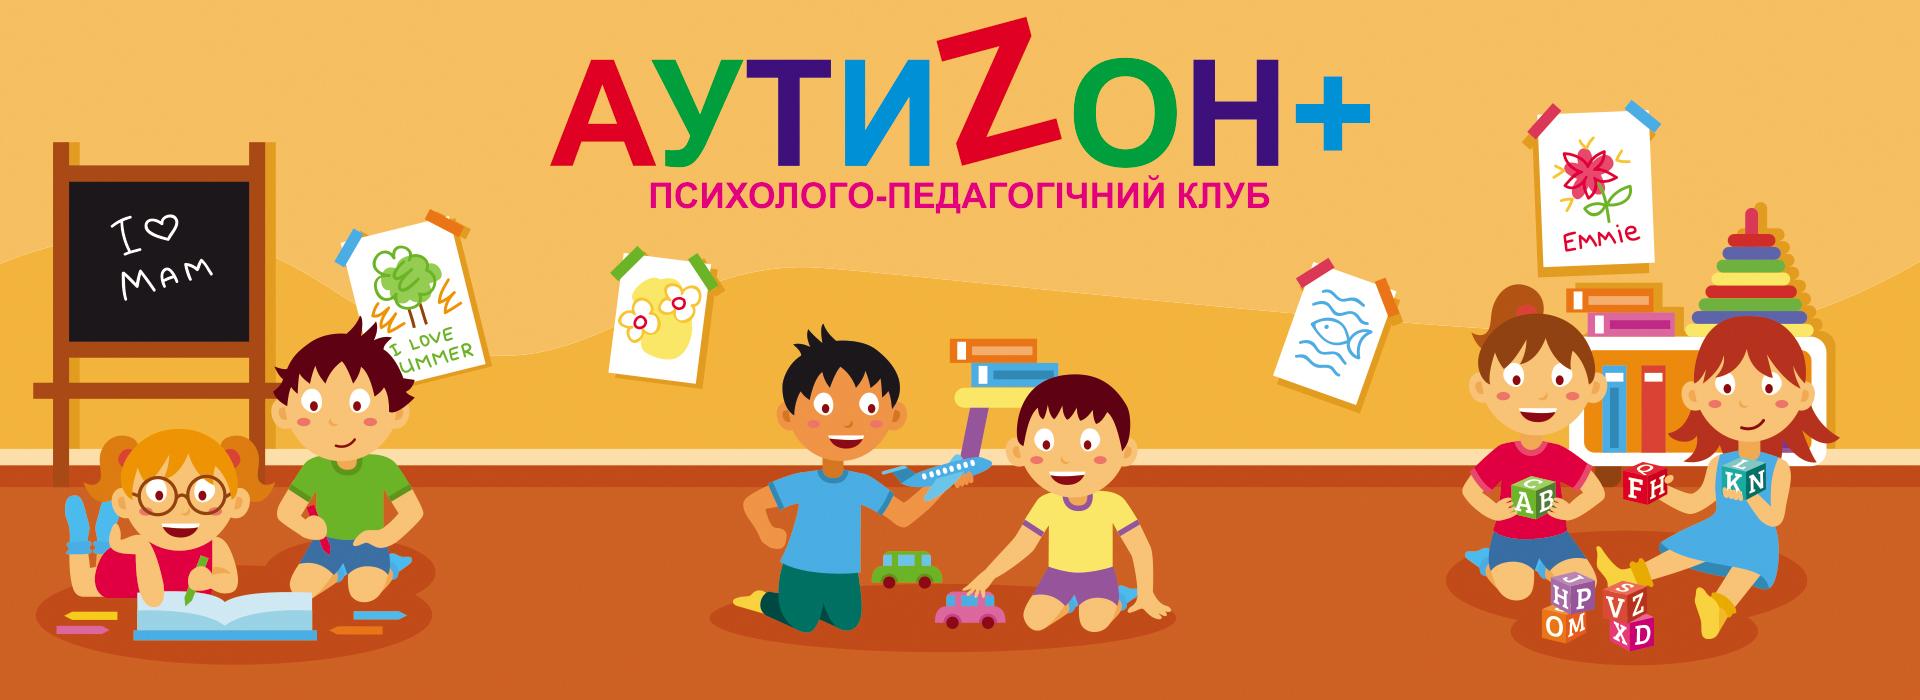 Клуб розвитку дитини Аутизон